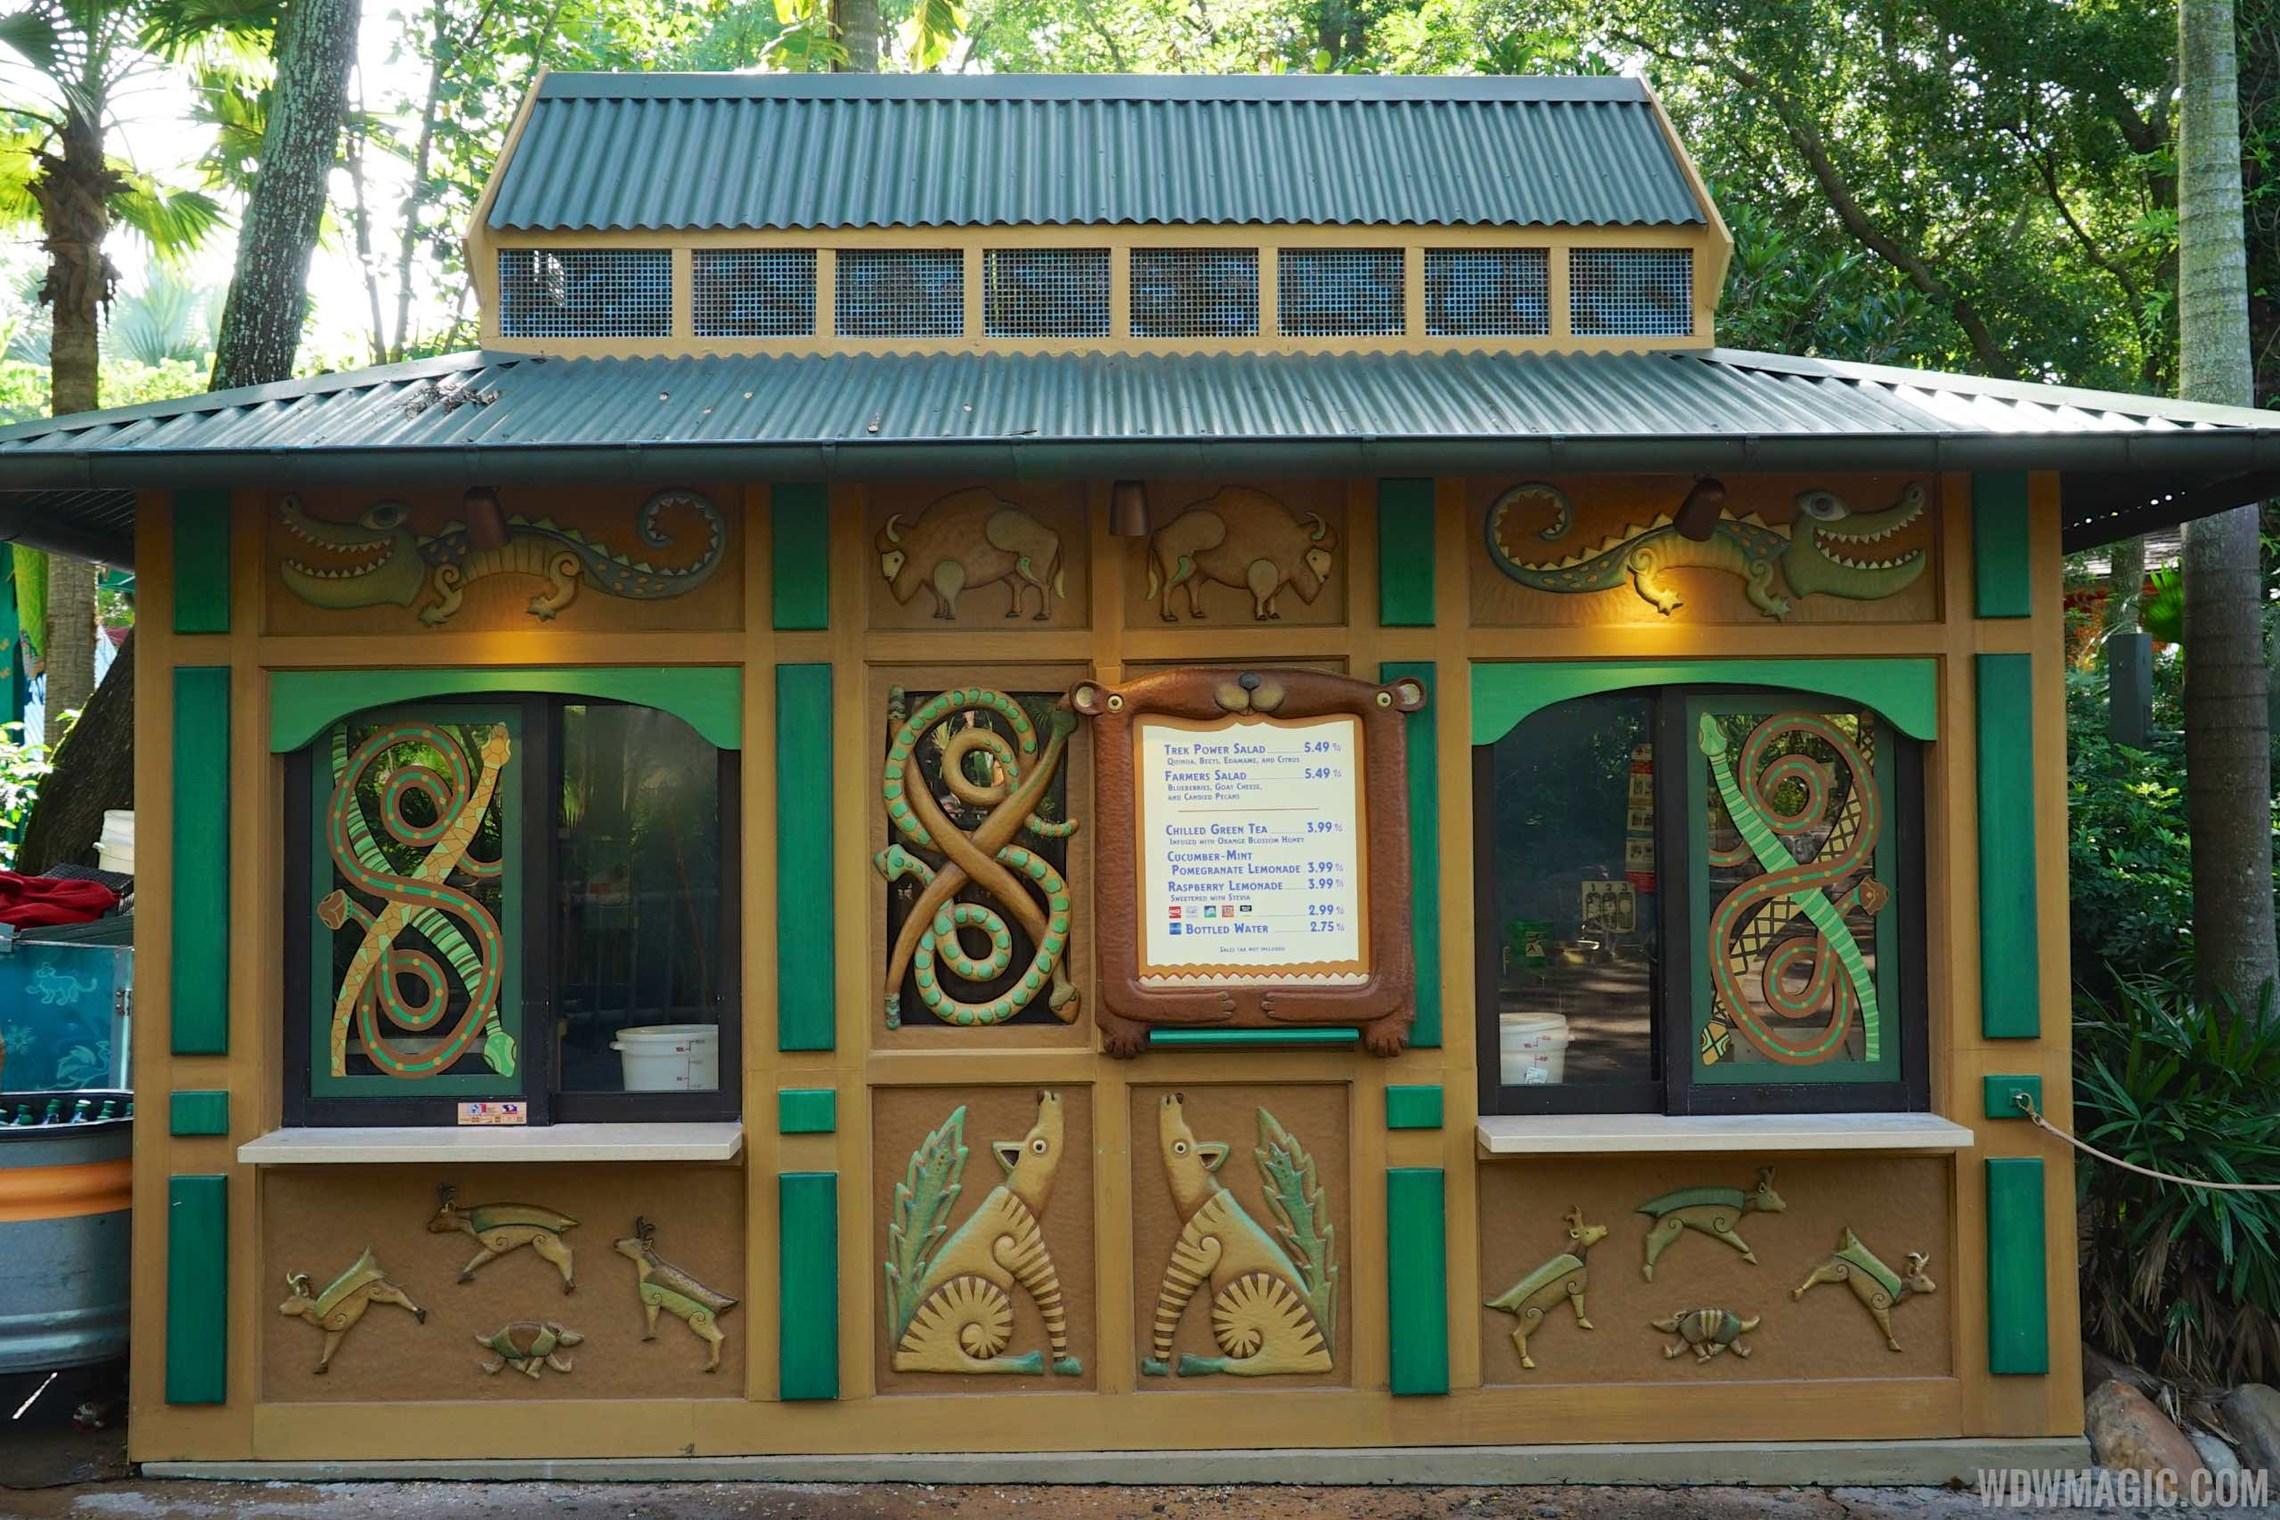 New-look Gardens Kiosk